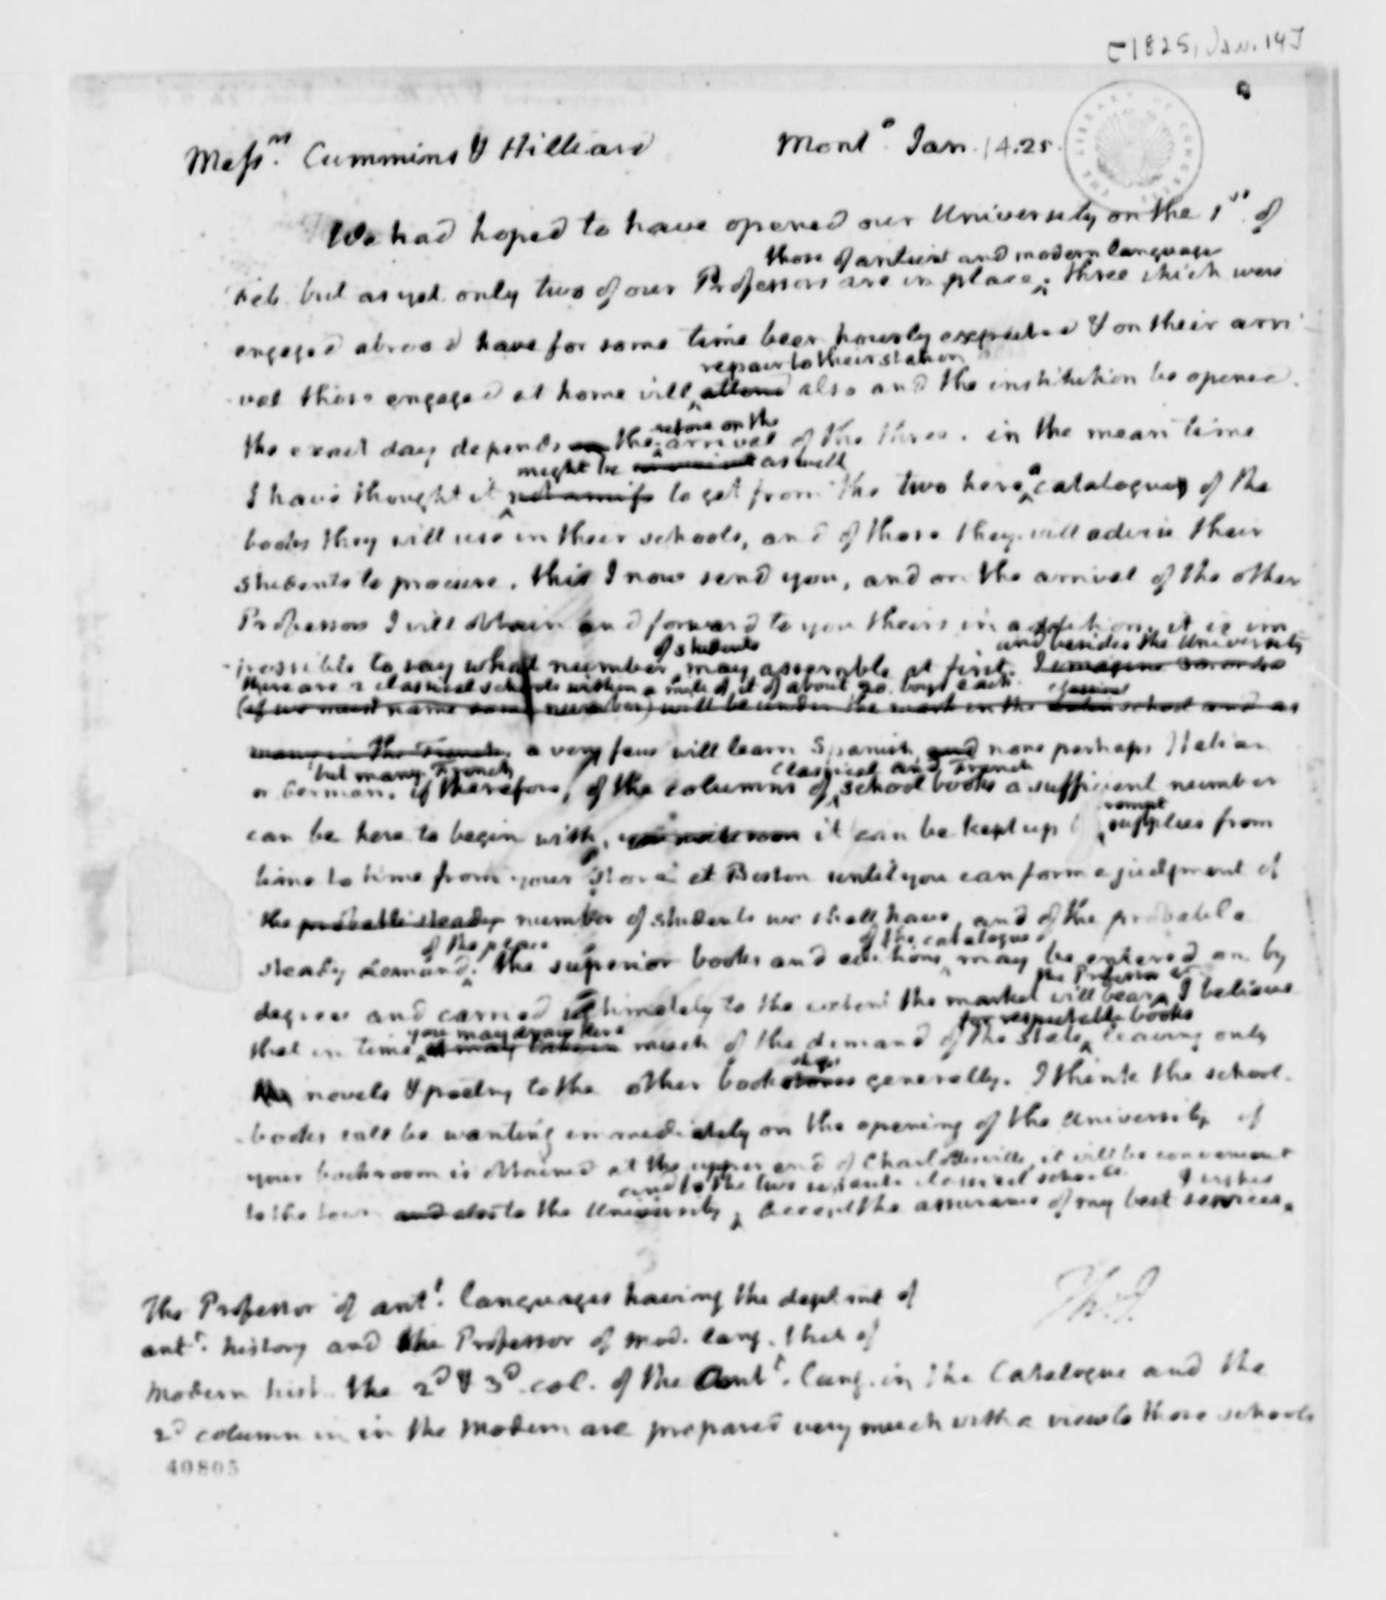 Thomas Jefferson to Cummings & Hillard, January 14, 1825